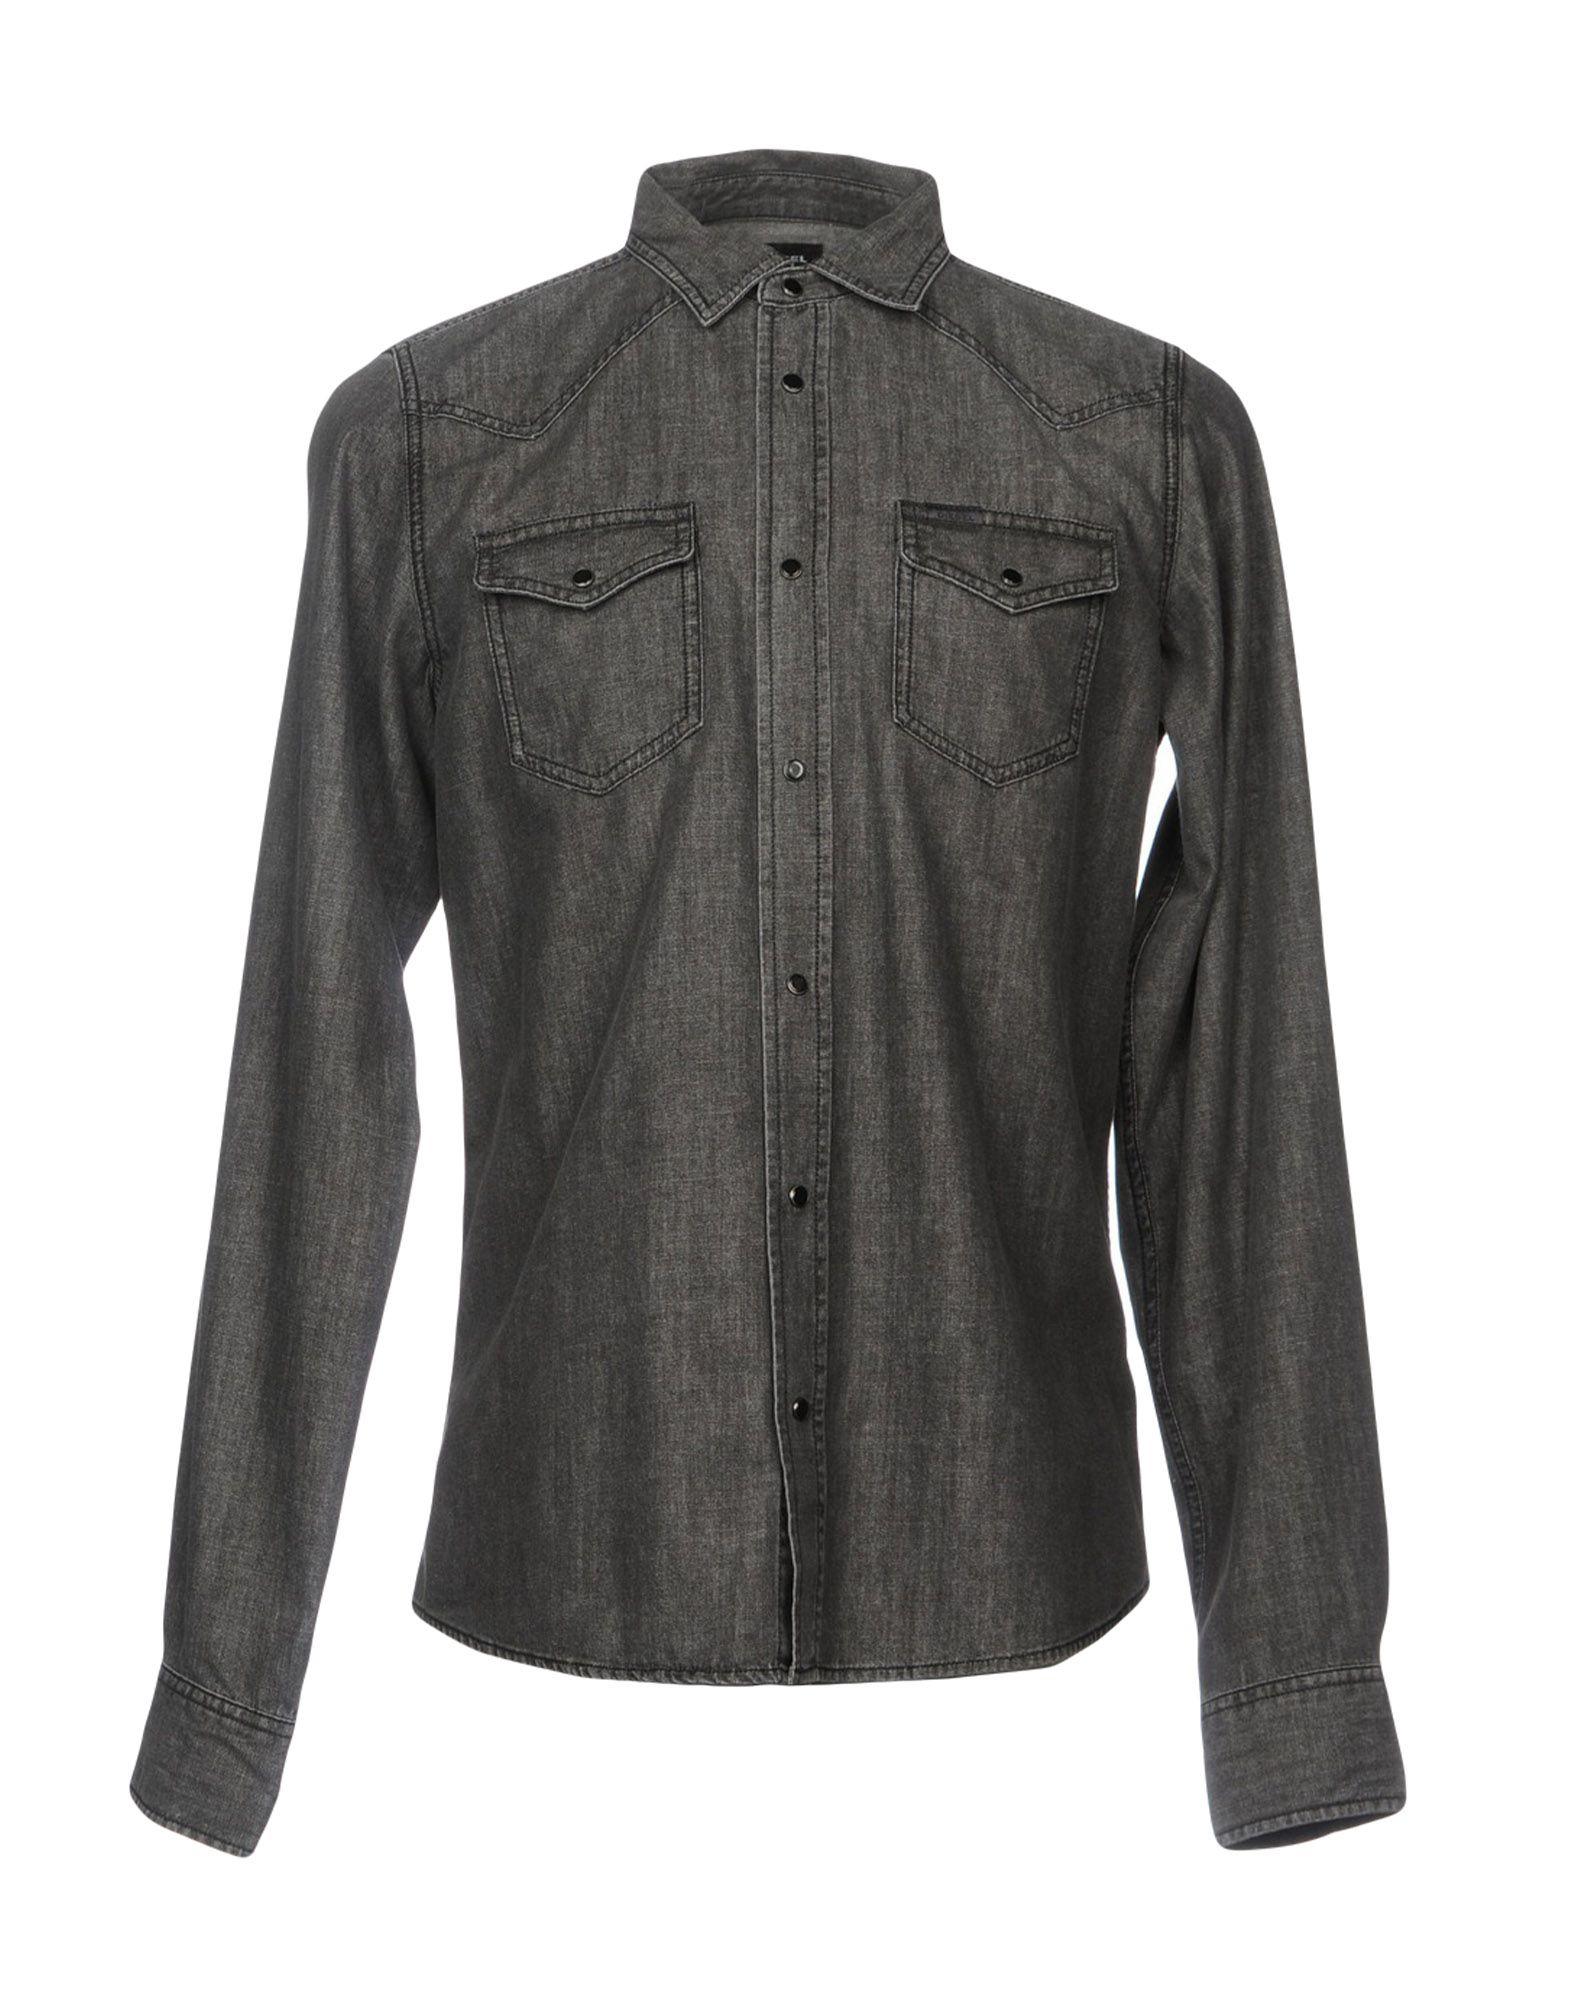 DIESEL Джинсовая рубашка mcr джинсовая рубашка